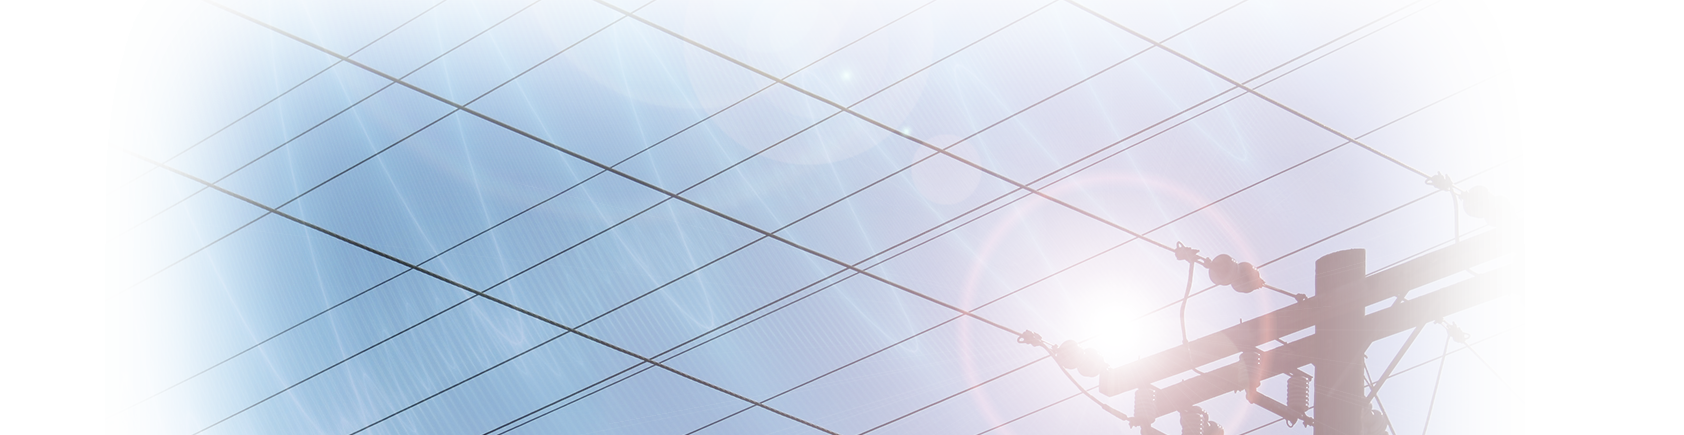 SATEC EM133 Smart DIN Rail TOU Energy Meter